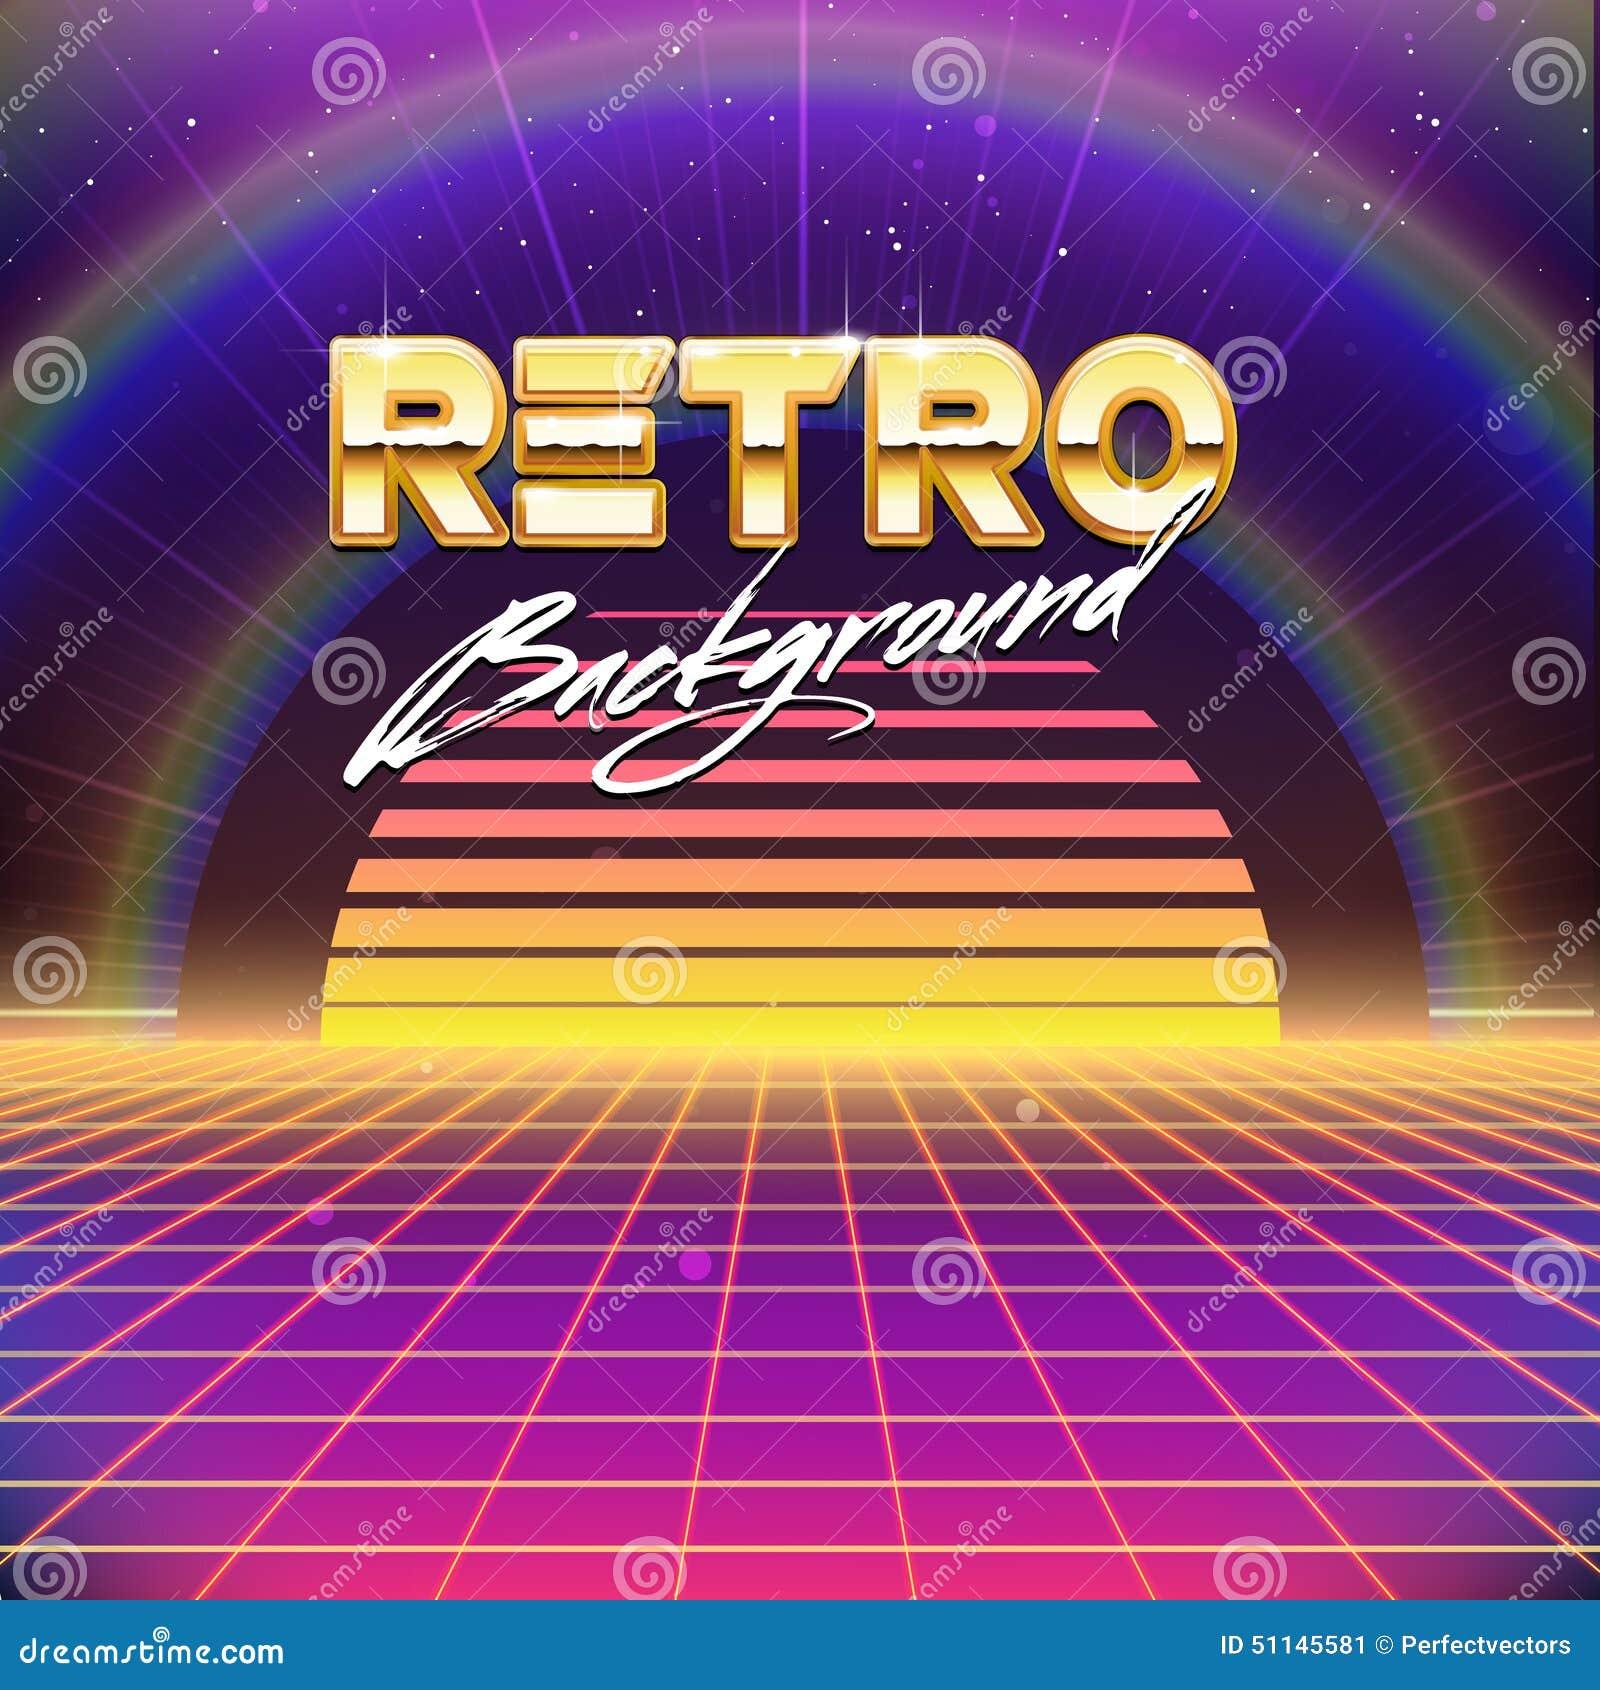 Vintage Science Fiction Wallpaper Google Search: 80s Retro Futurism Sci-Fi Background Stock Vector